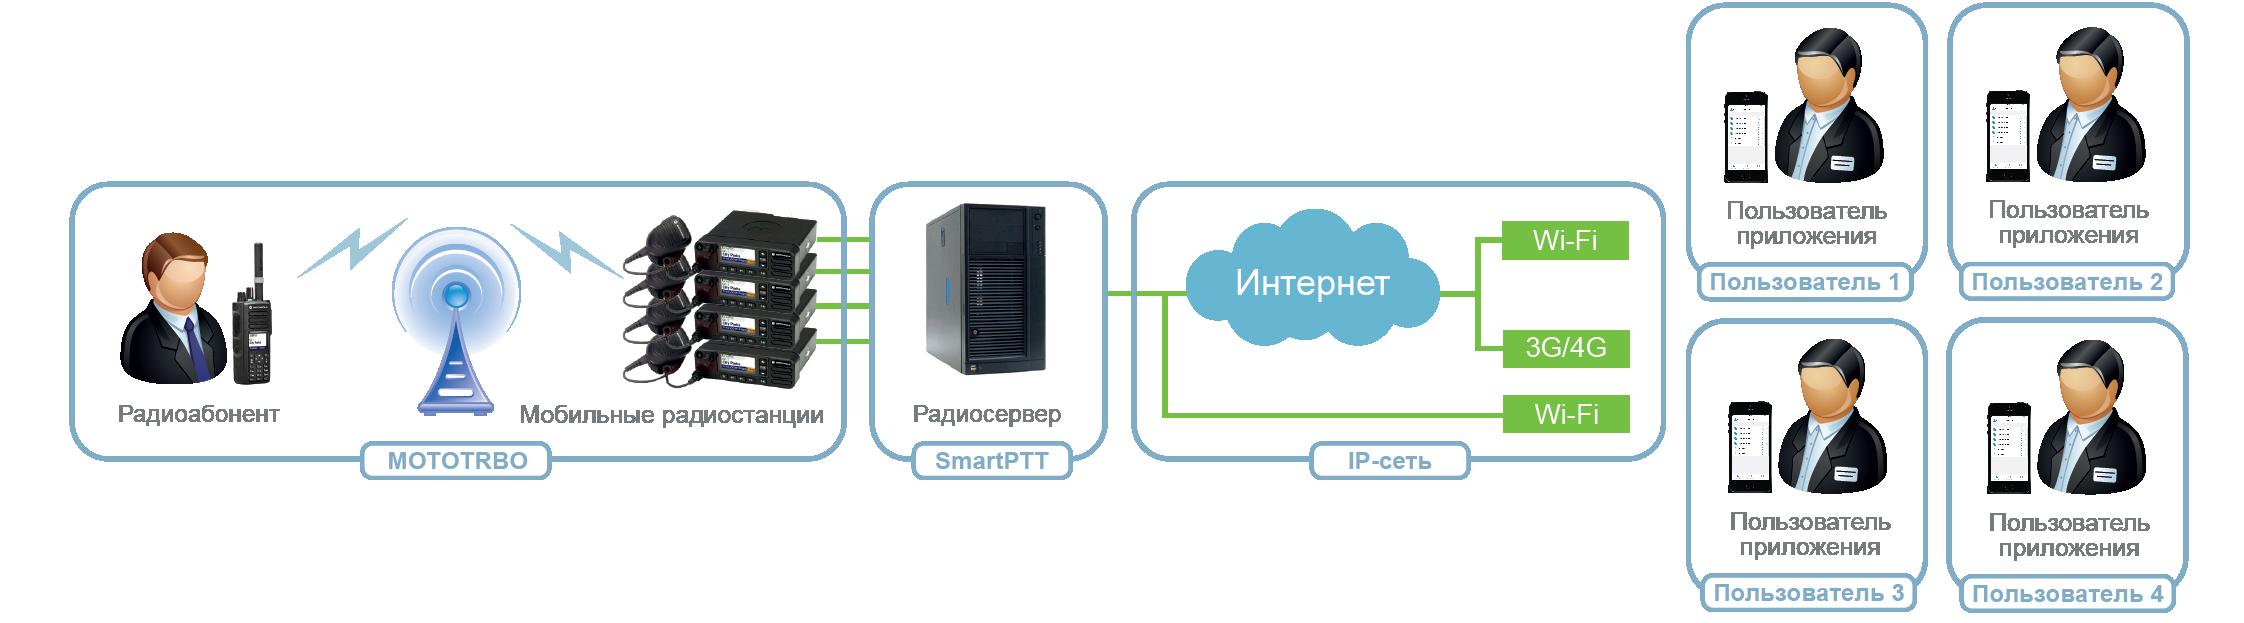 SmartPTT Mobile 2 configuration